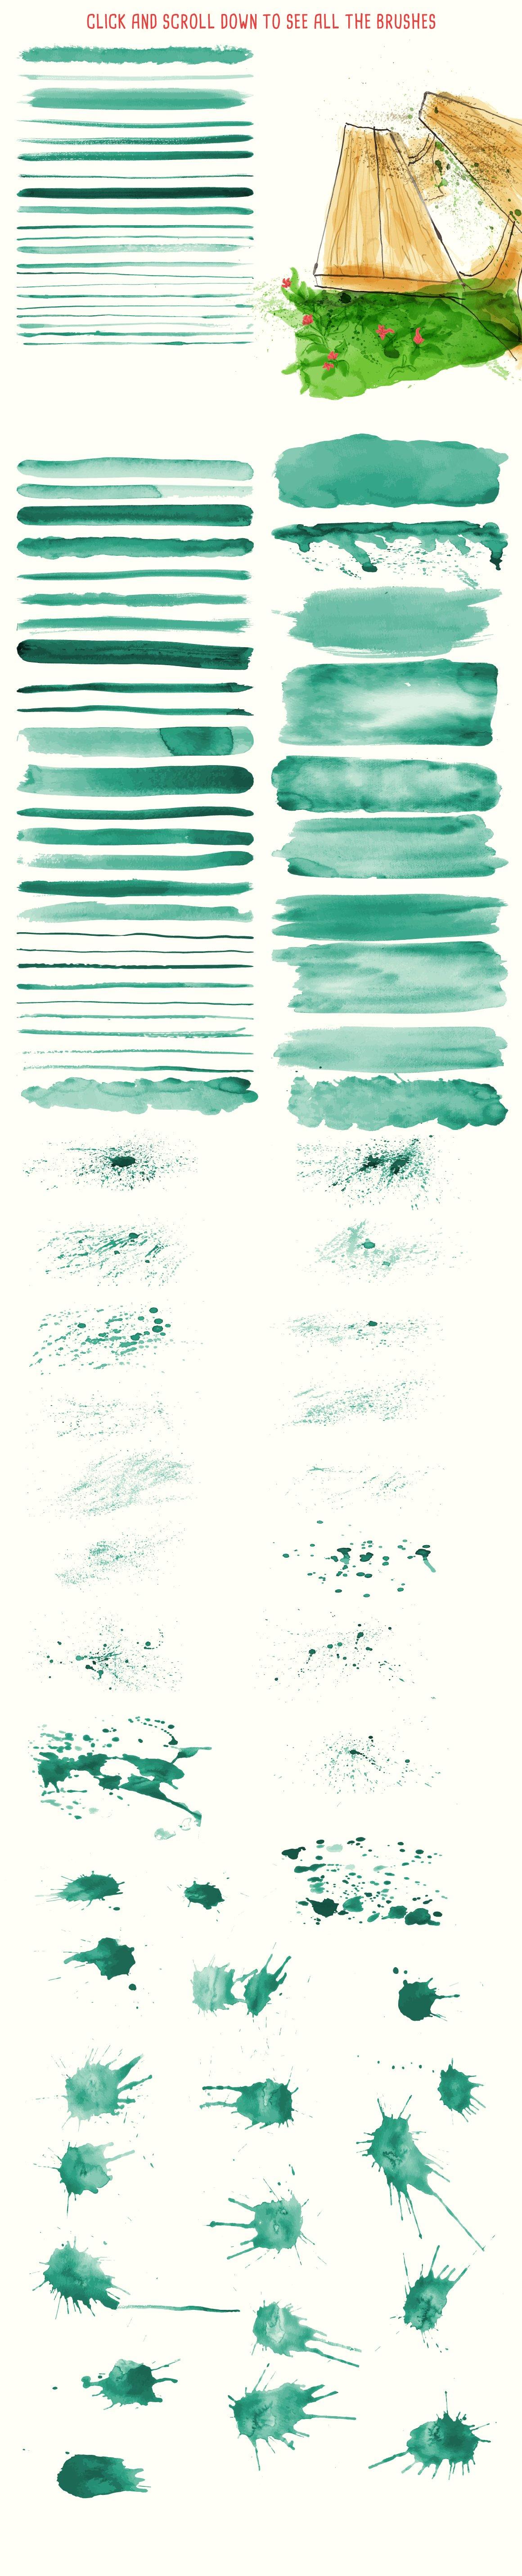 94款手绘水彩矢量艺术笔刷背景纹理 Watercolor Vector Art Brushes插图(1)